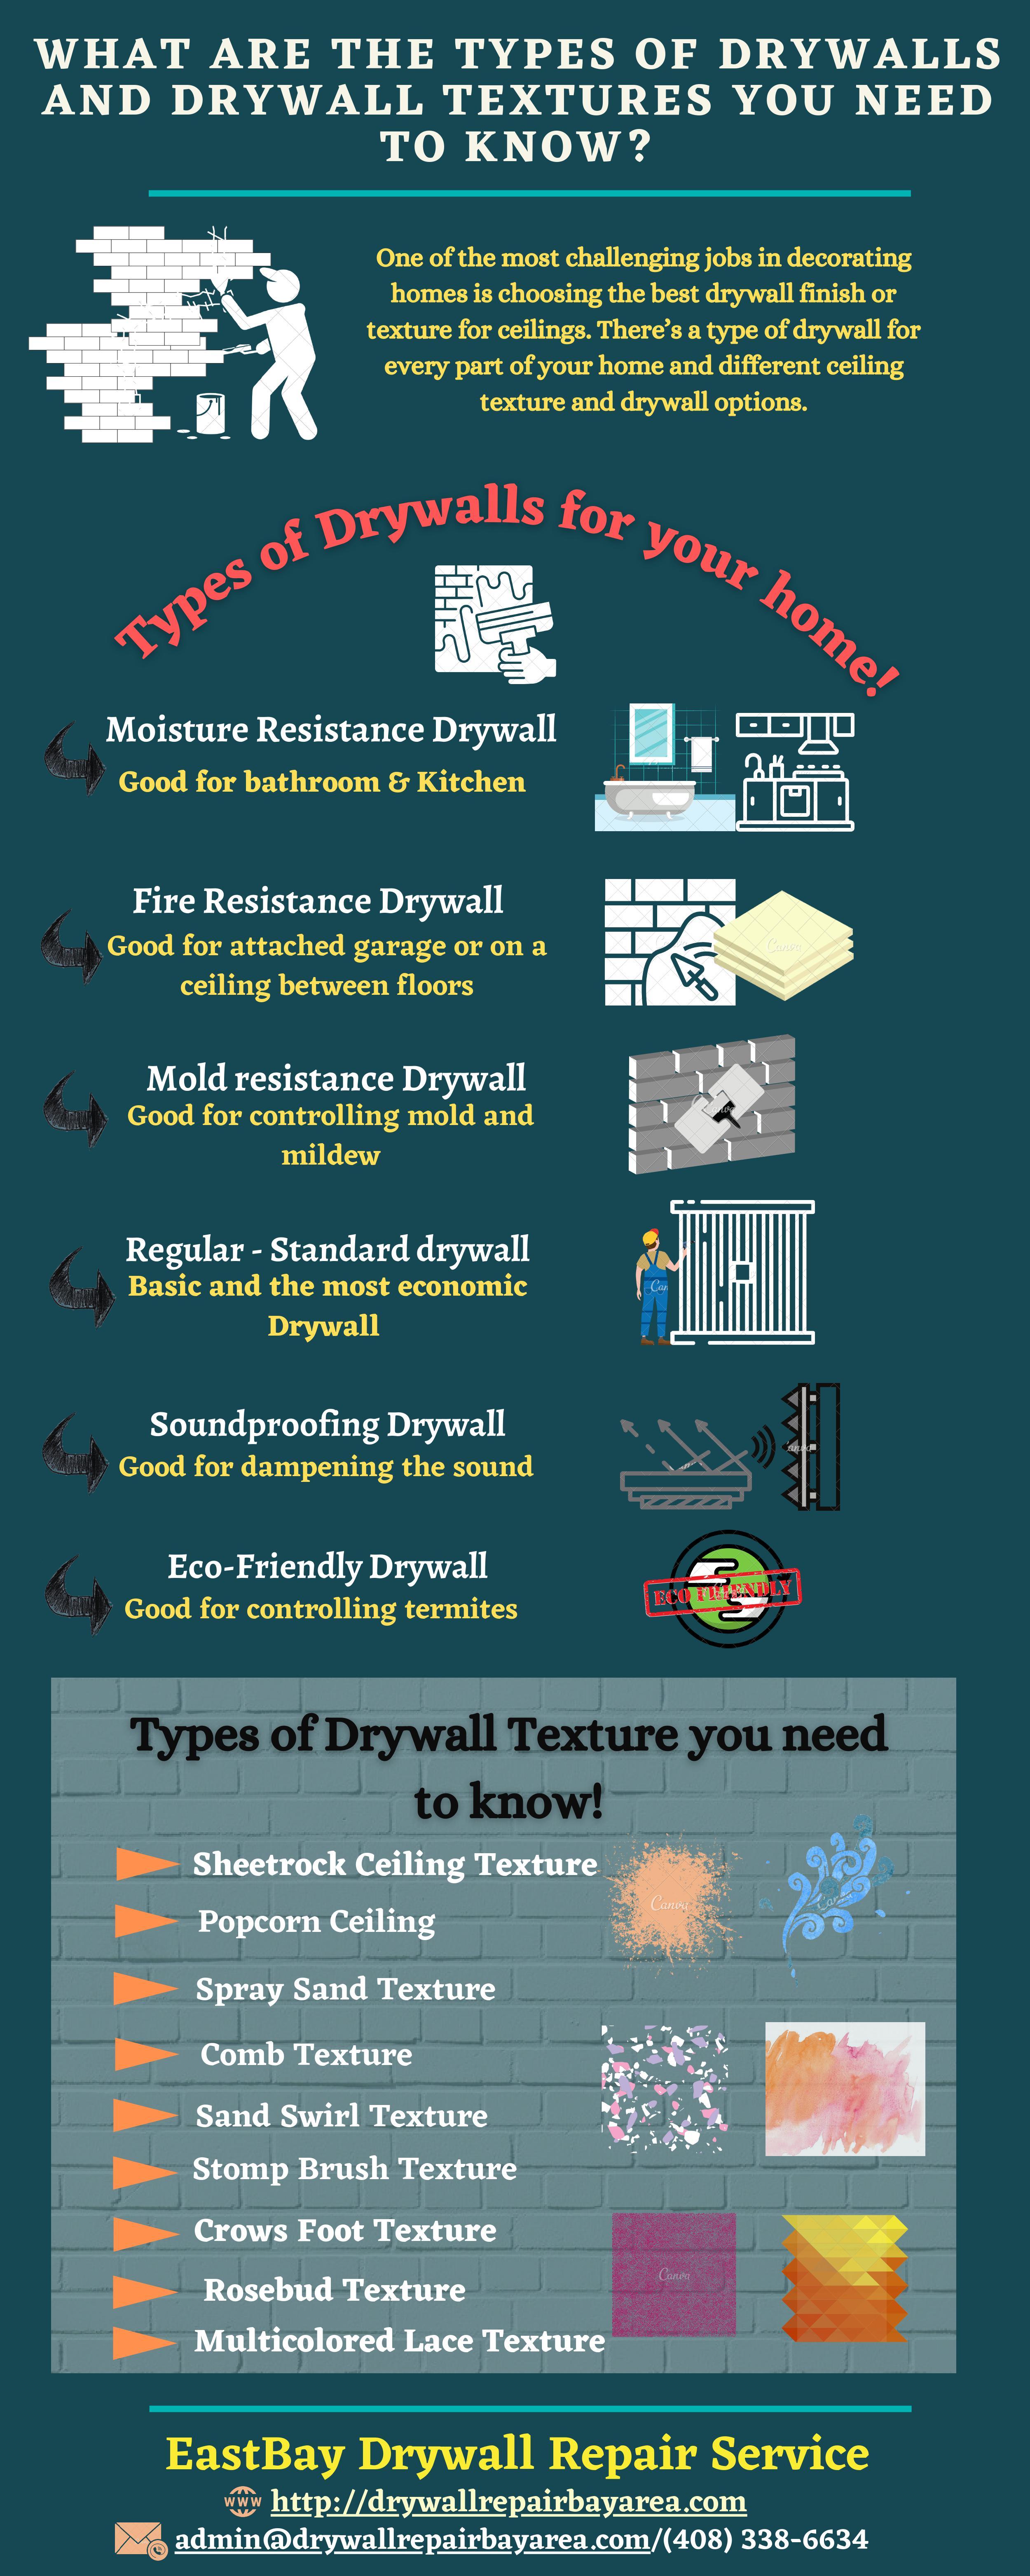 EastBay Drywall Repair Service